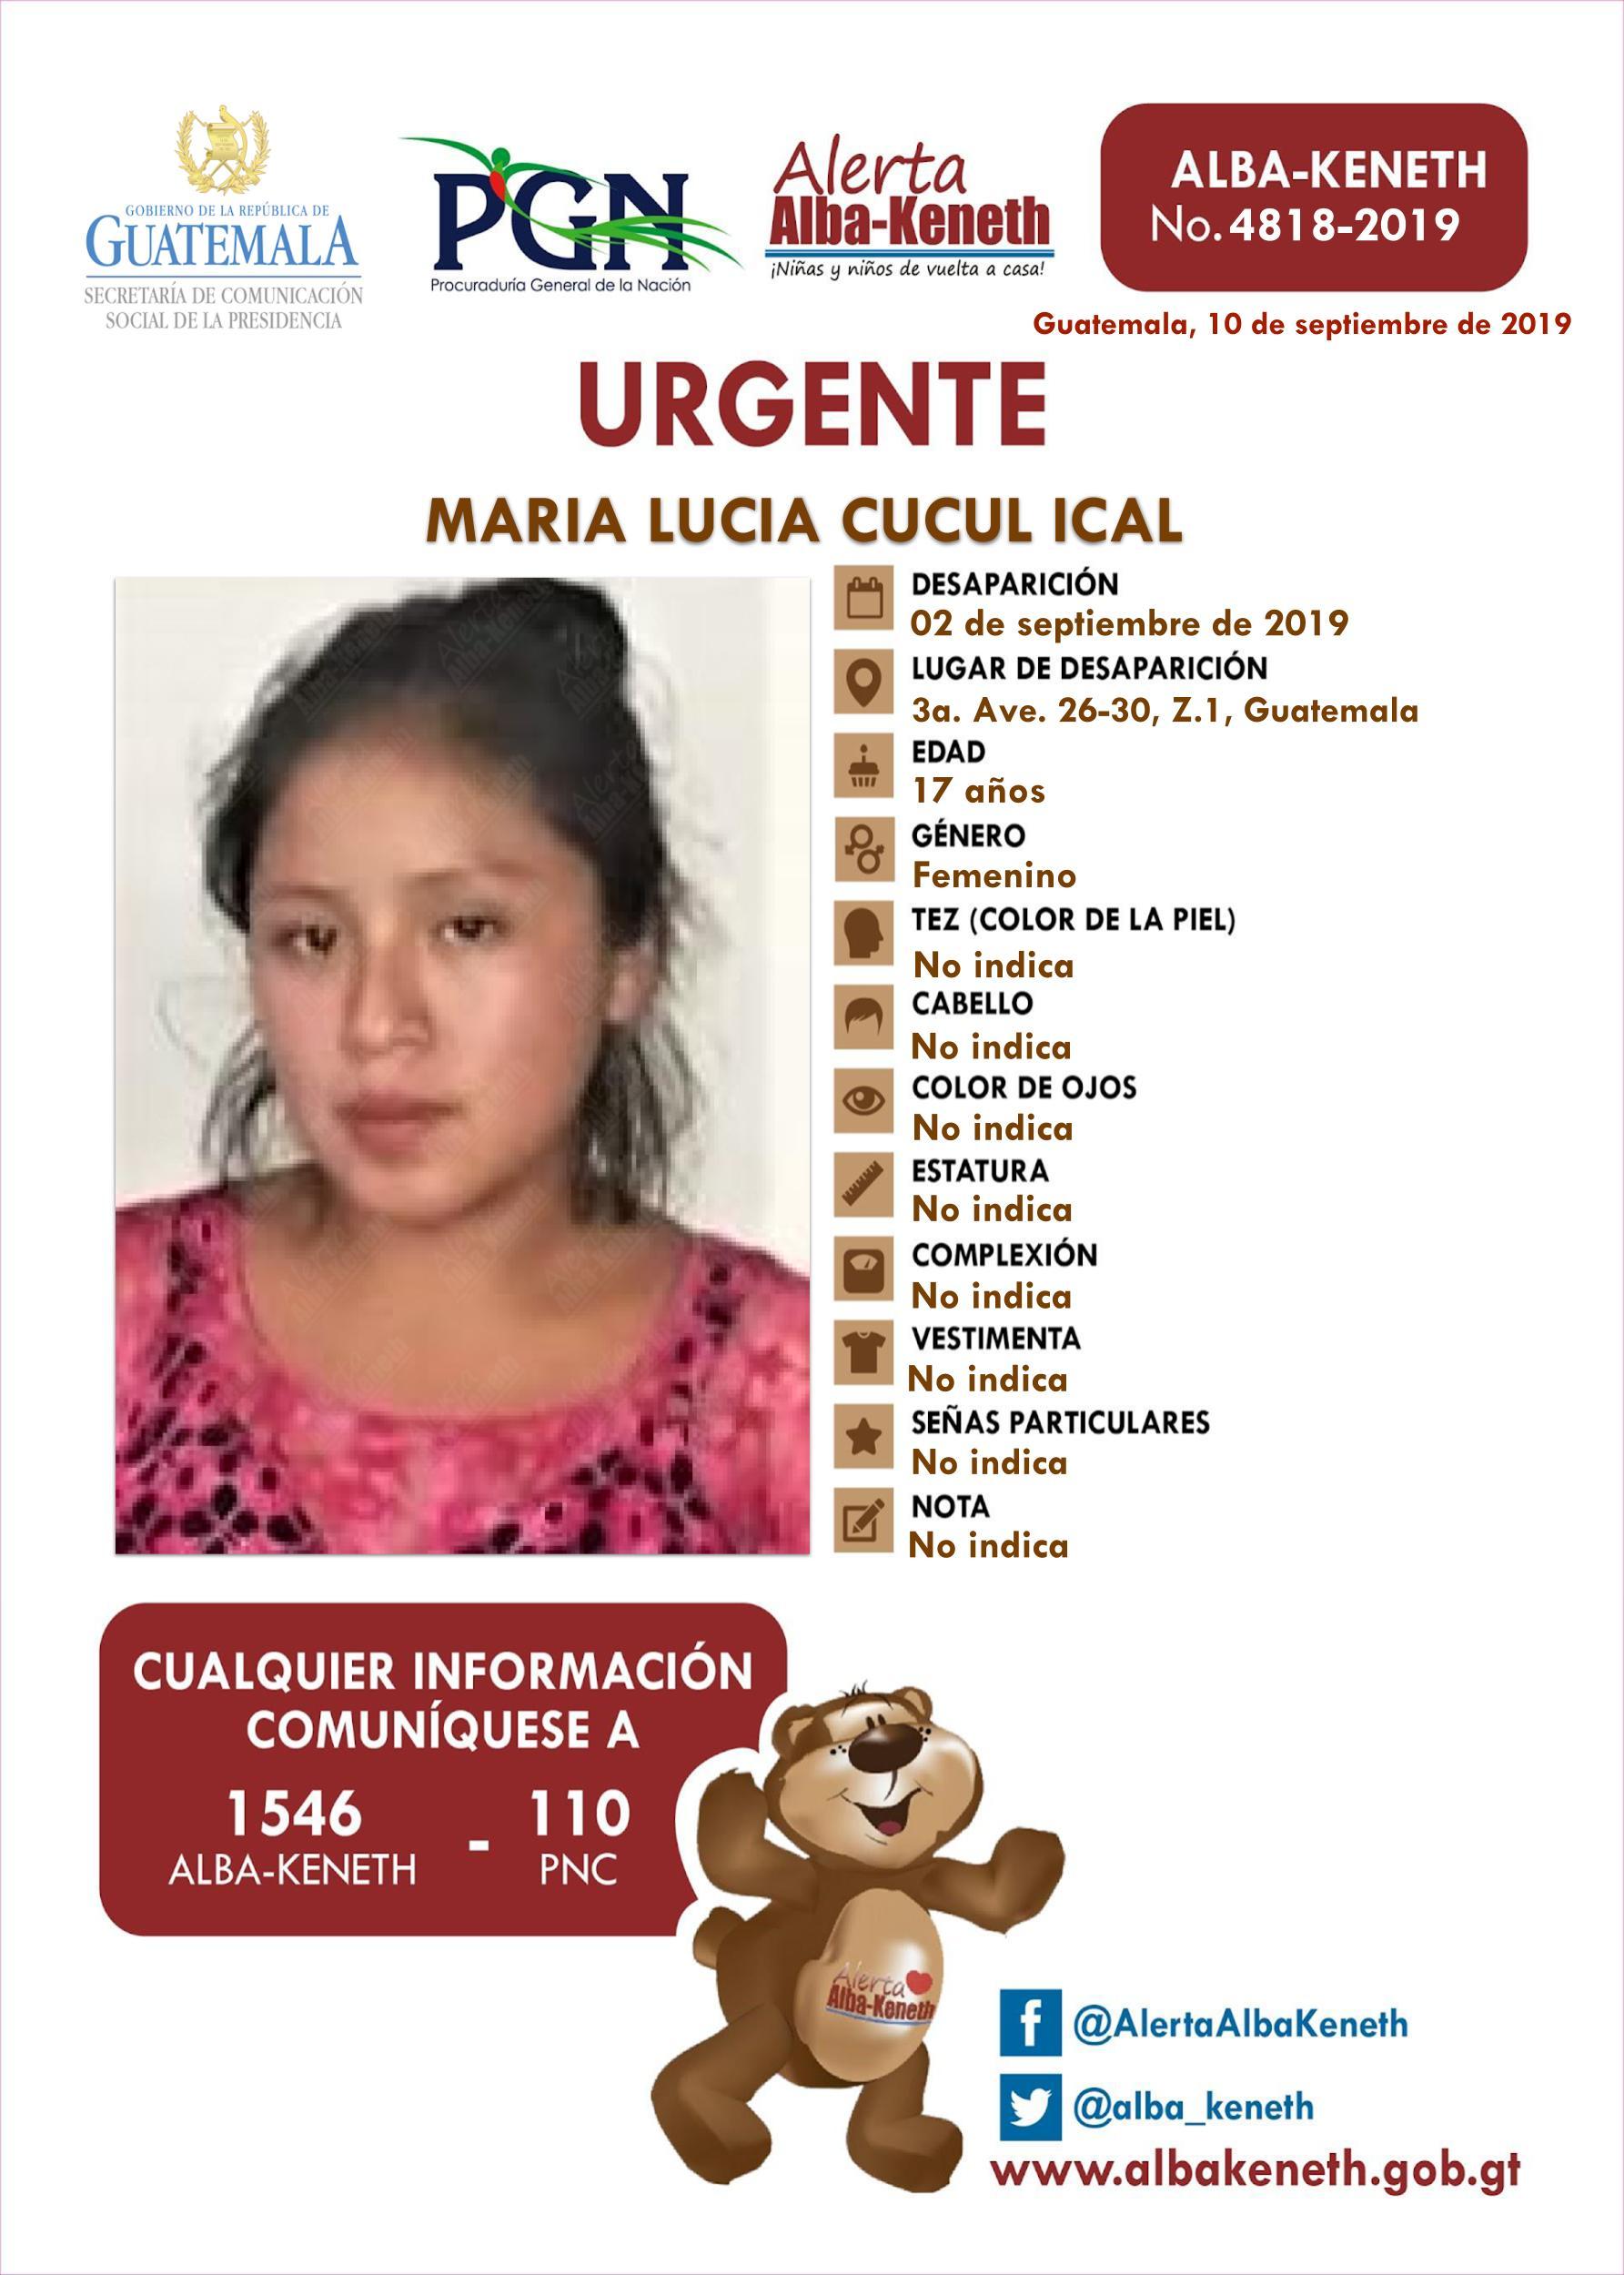 Maria Lucia Cucul Ical